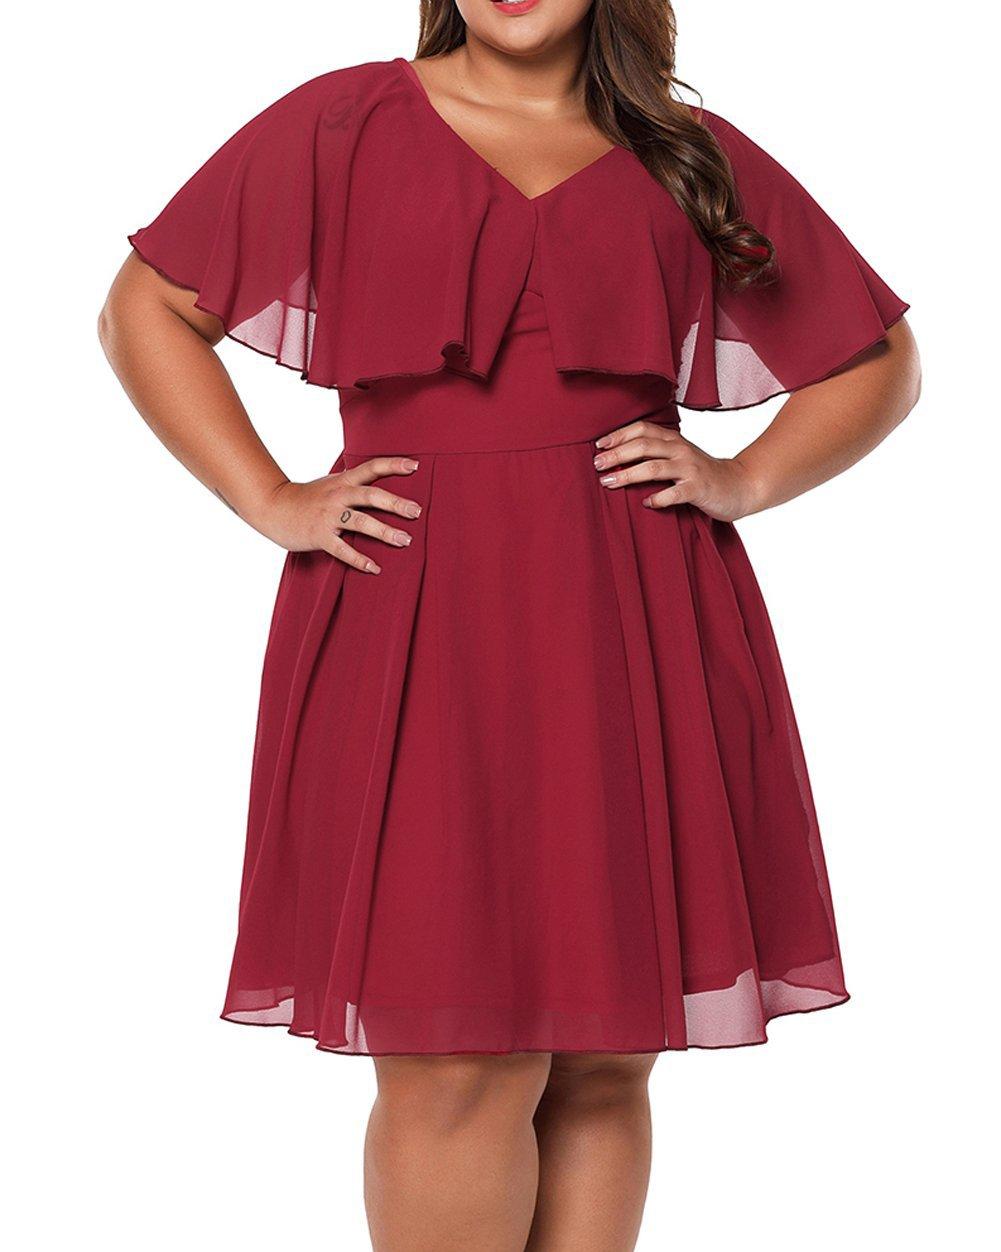 Rotita Women Ruffle Plus Size A Line Dress Sexy V Neck Pleated Fit and Flare Midi Dress